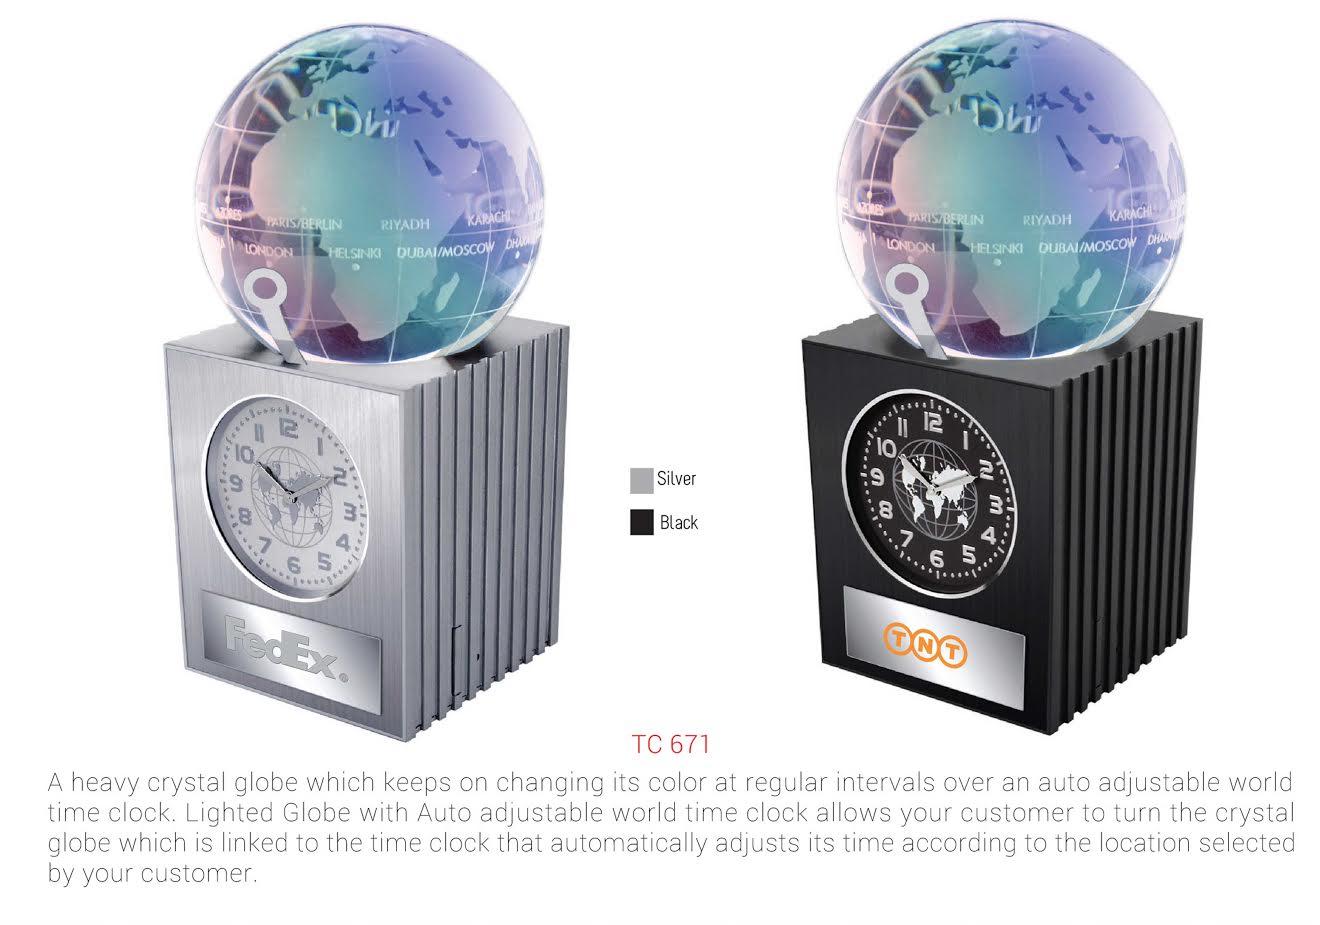 Desktop clock with crystal globe tc-671